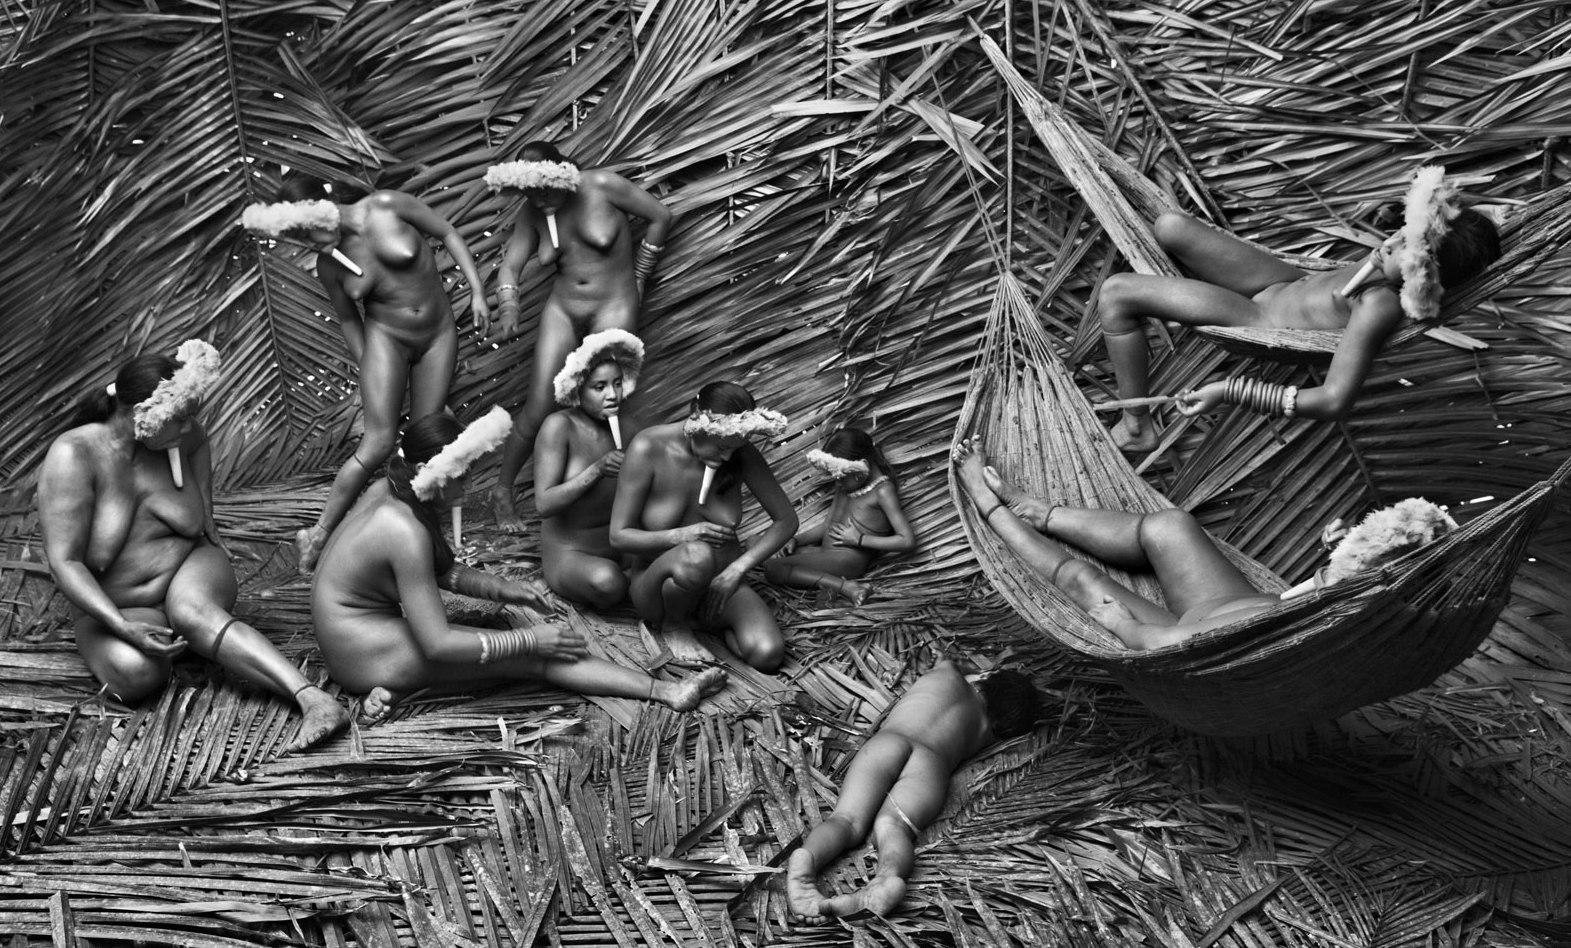 Sebastião Salgado, PHOTOGRAPHER, ΣΕΜΠΑΣΤΙΑΟ ΣΑΛΓΑΔΟ, ΦΩΤΟΓΡΑΦΟΣ, ΤΟ BLOG ΤΟΥ ΝΙΚΟΥ ΜΟΥΡΑΤΙΔΗ, nikosonline.gr,